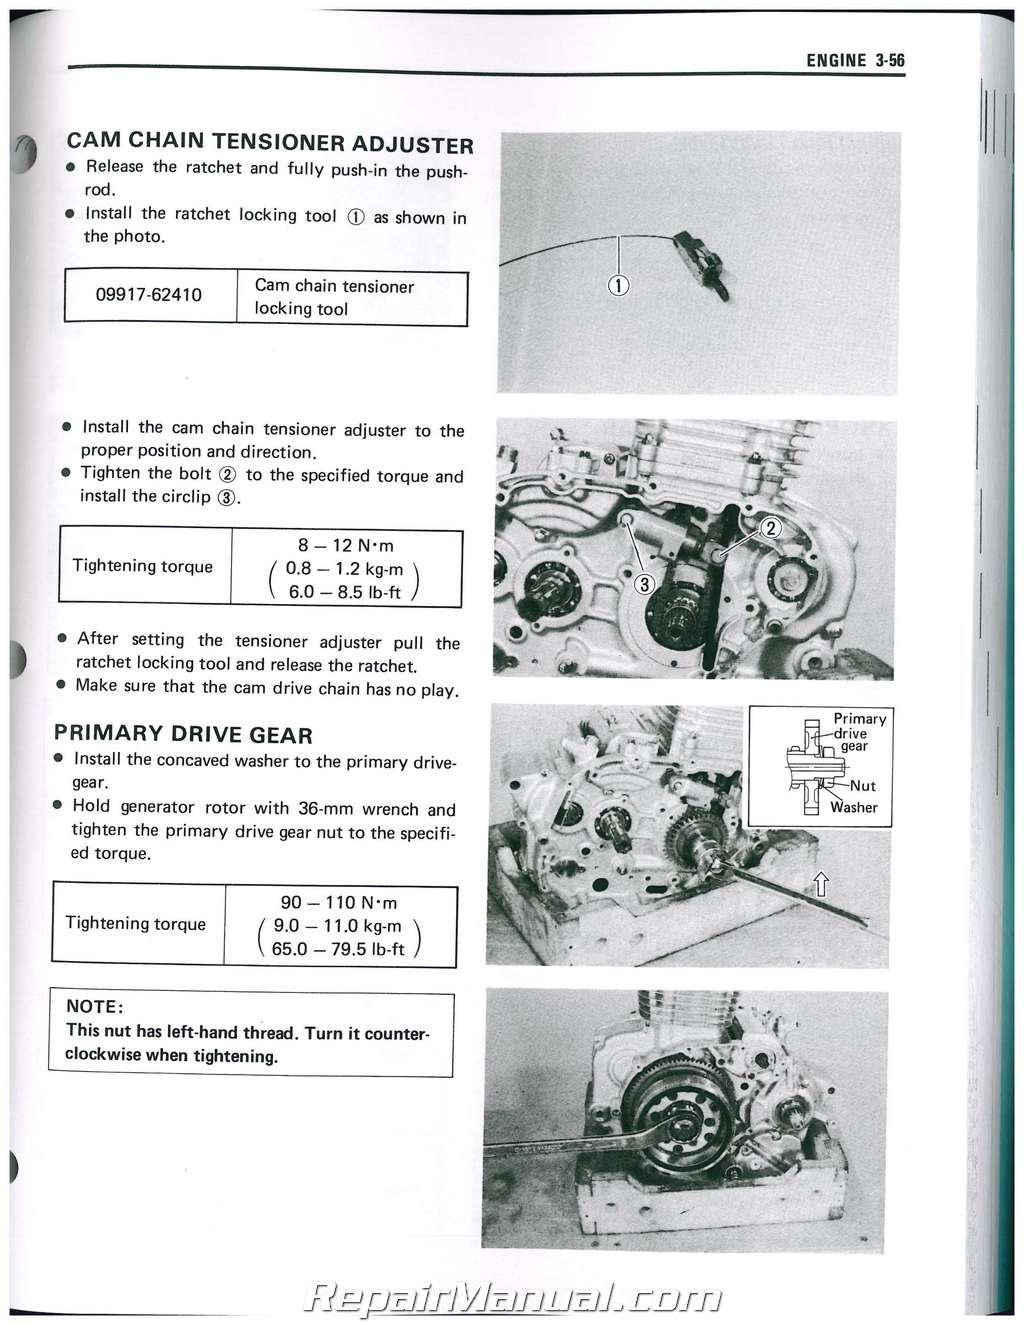 LS650 Savage / S40 Boulevard 1986-2016 Suzuki Motorcycle Service Manual